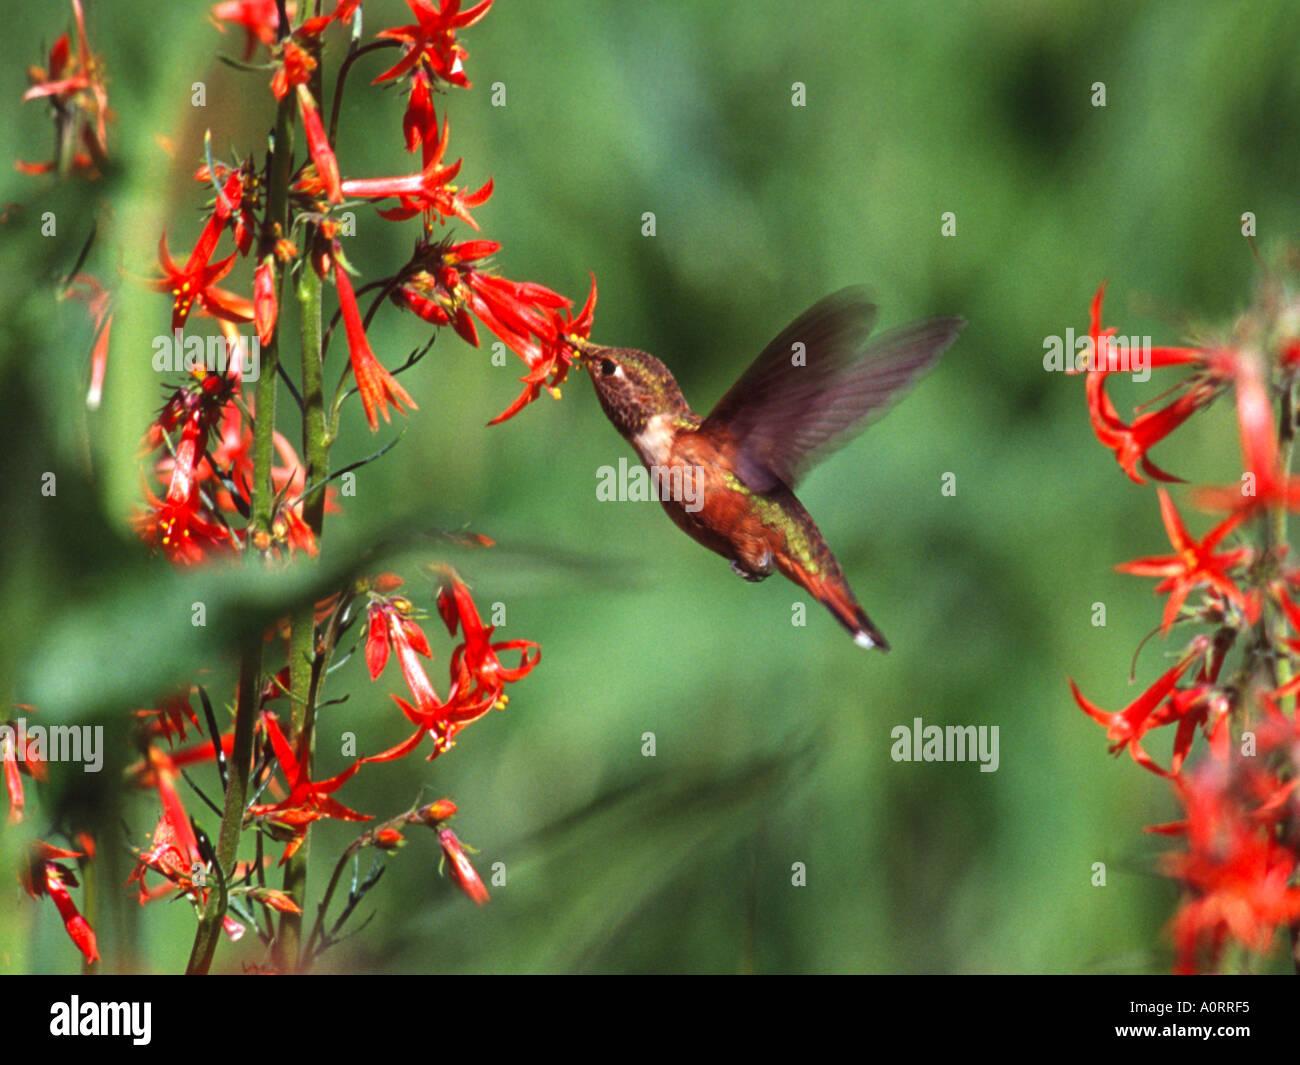 Rufous Hummingbird taking nectar from Skyrocket Gilia Blair Meadows Willamette National forest Oregon 157508U  - Stock Image